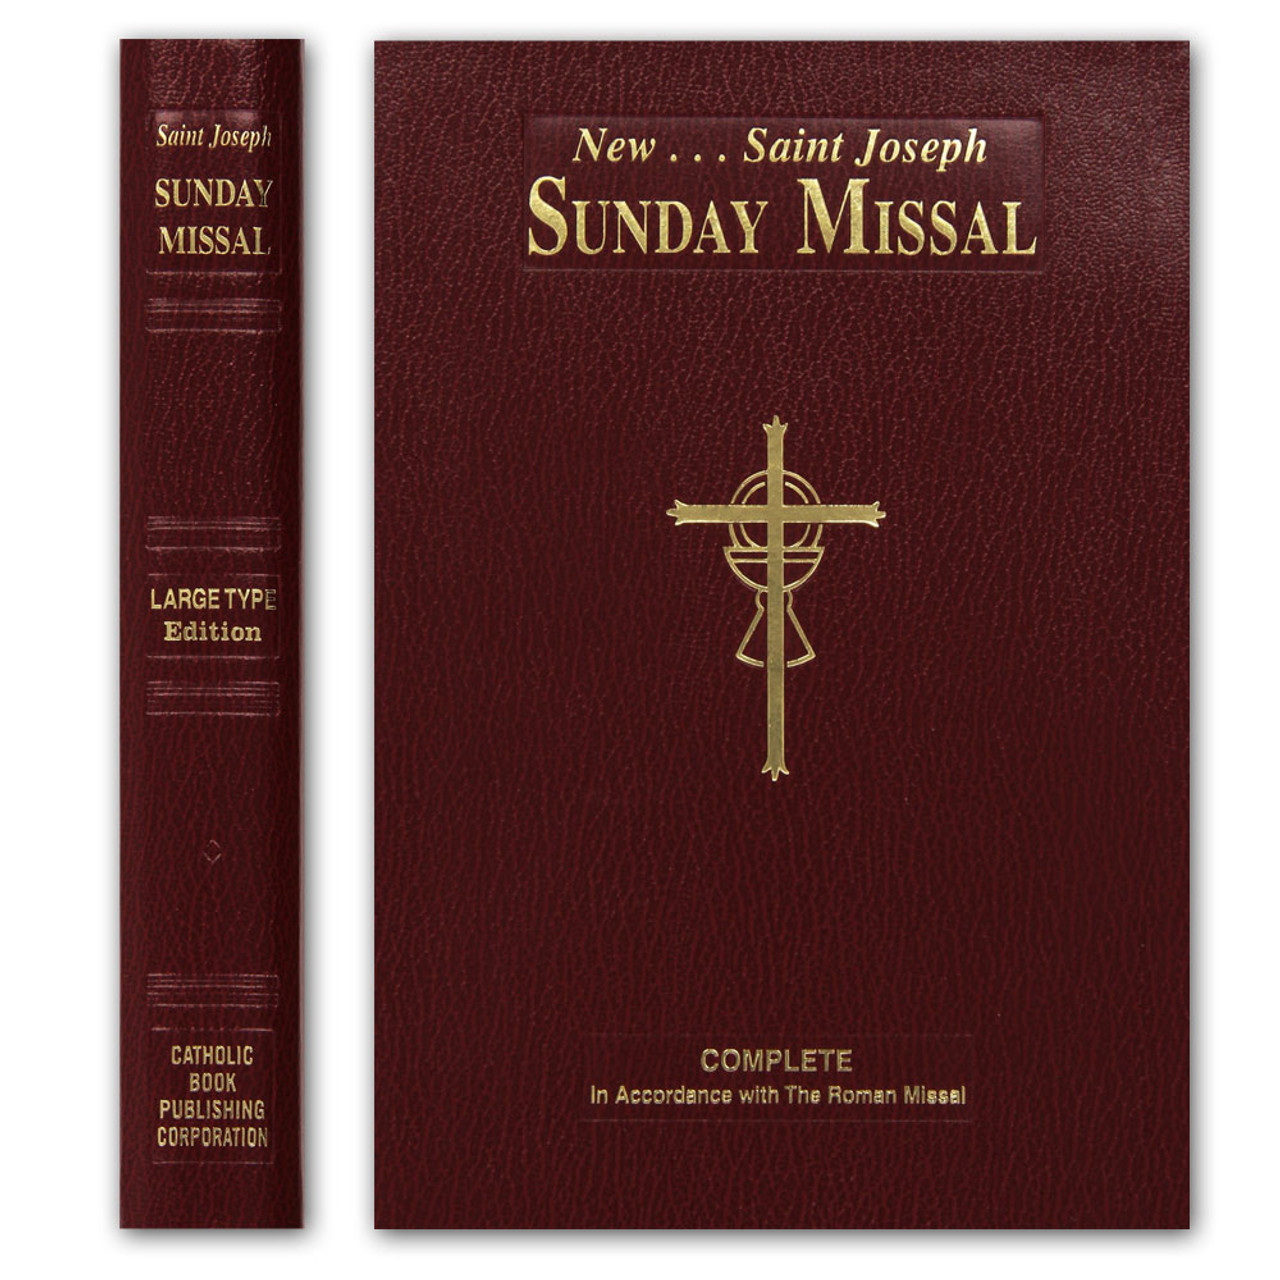 St Joseph Sunday Missal Giant Type Edition